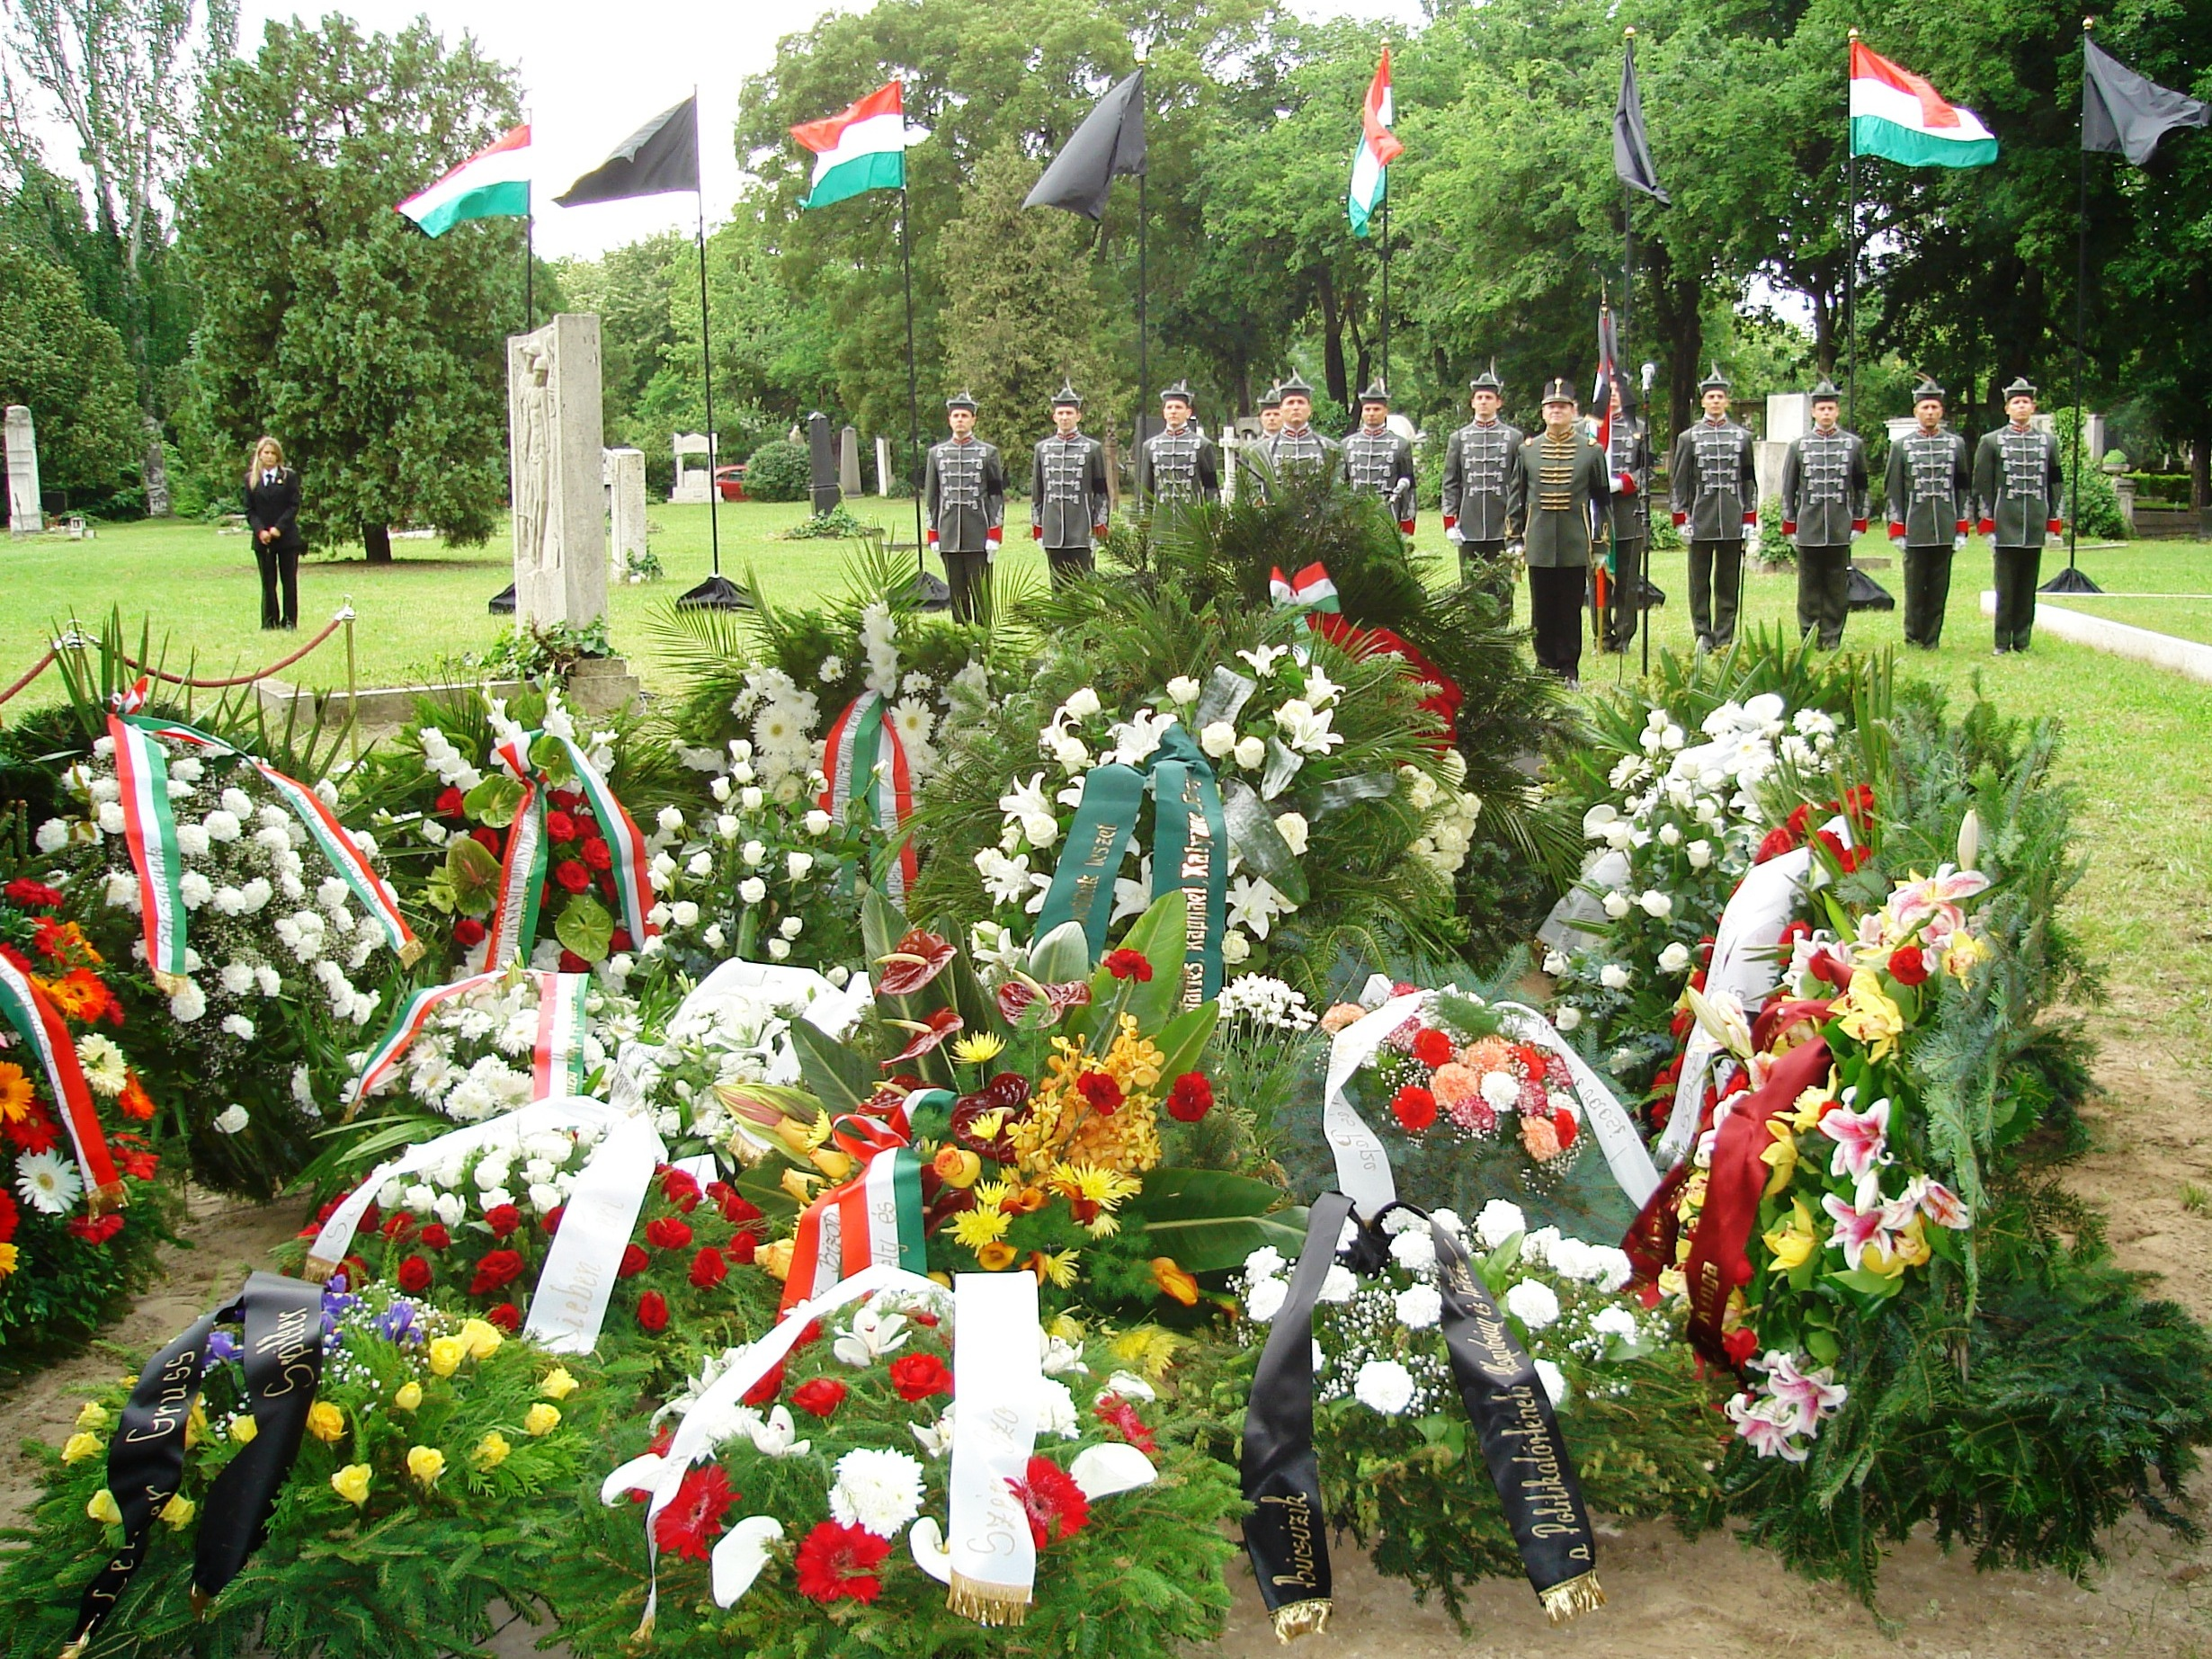 Filefejto funeral budapest 2g wikimedia commons filefejto funeral budapest 2g izmirmasajfo